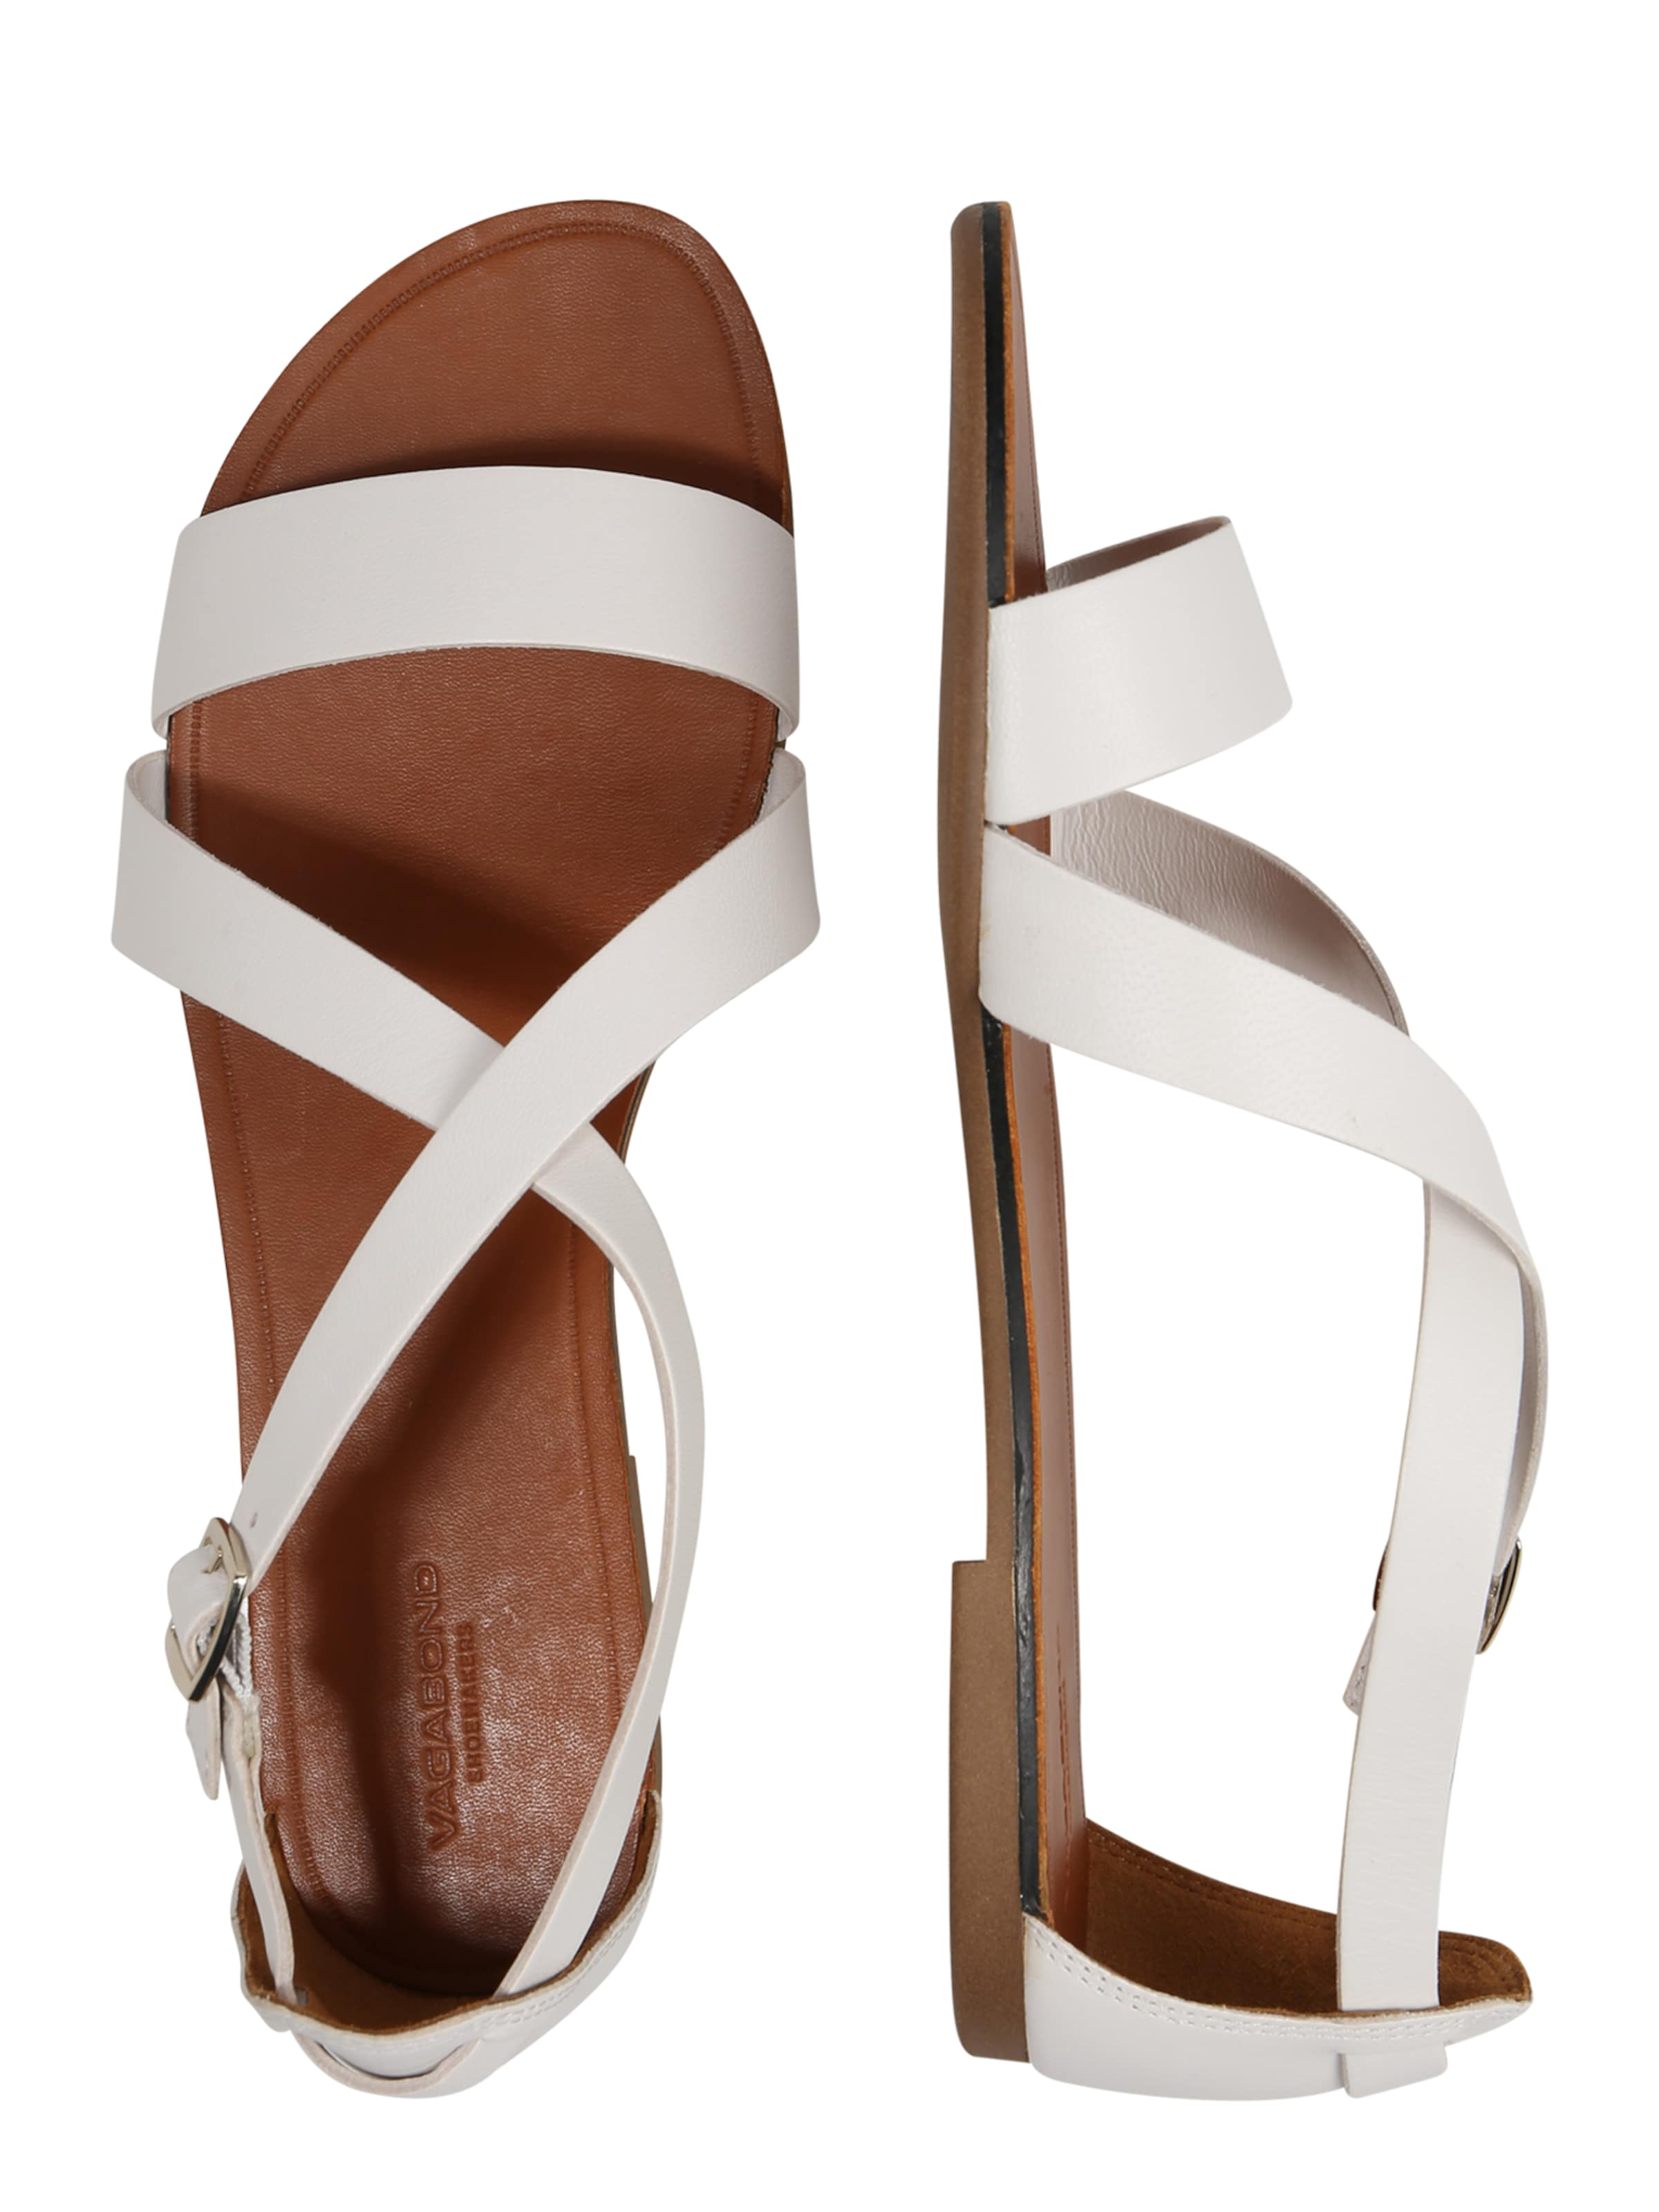 Sandalen In 'tia' Vagabond Weiß Shoemakers 5q4j3ALR